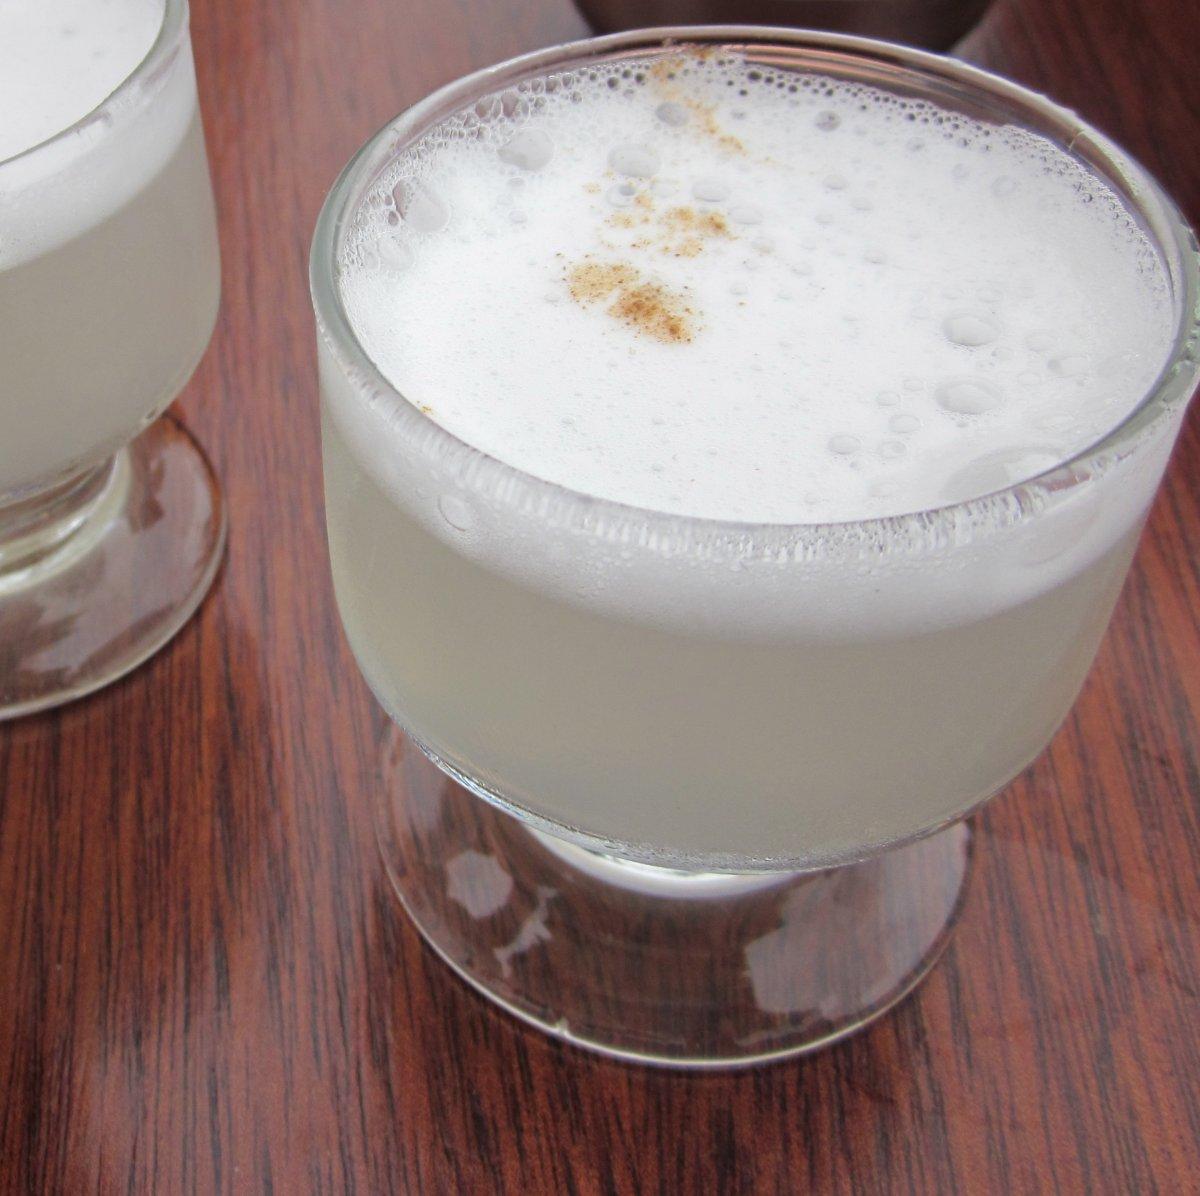 Alcoholic sweet drink